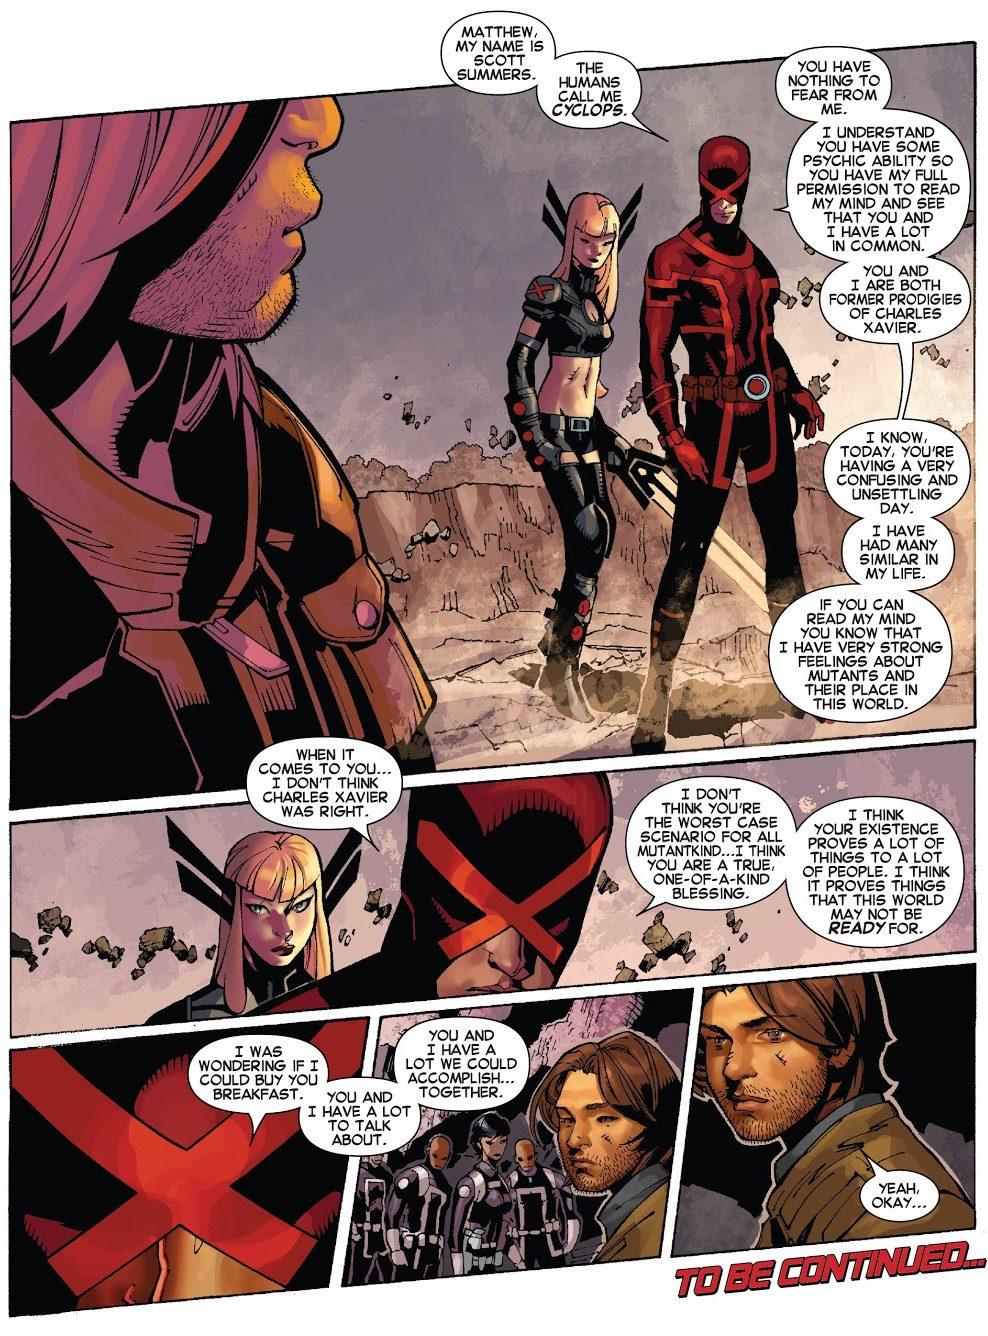 Cyclops Tries To Recruit Matthew Malloy